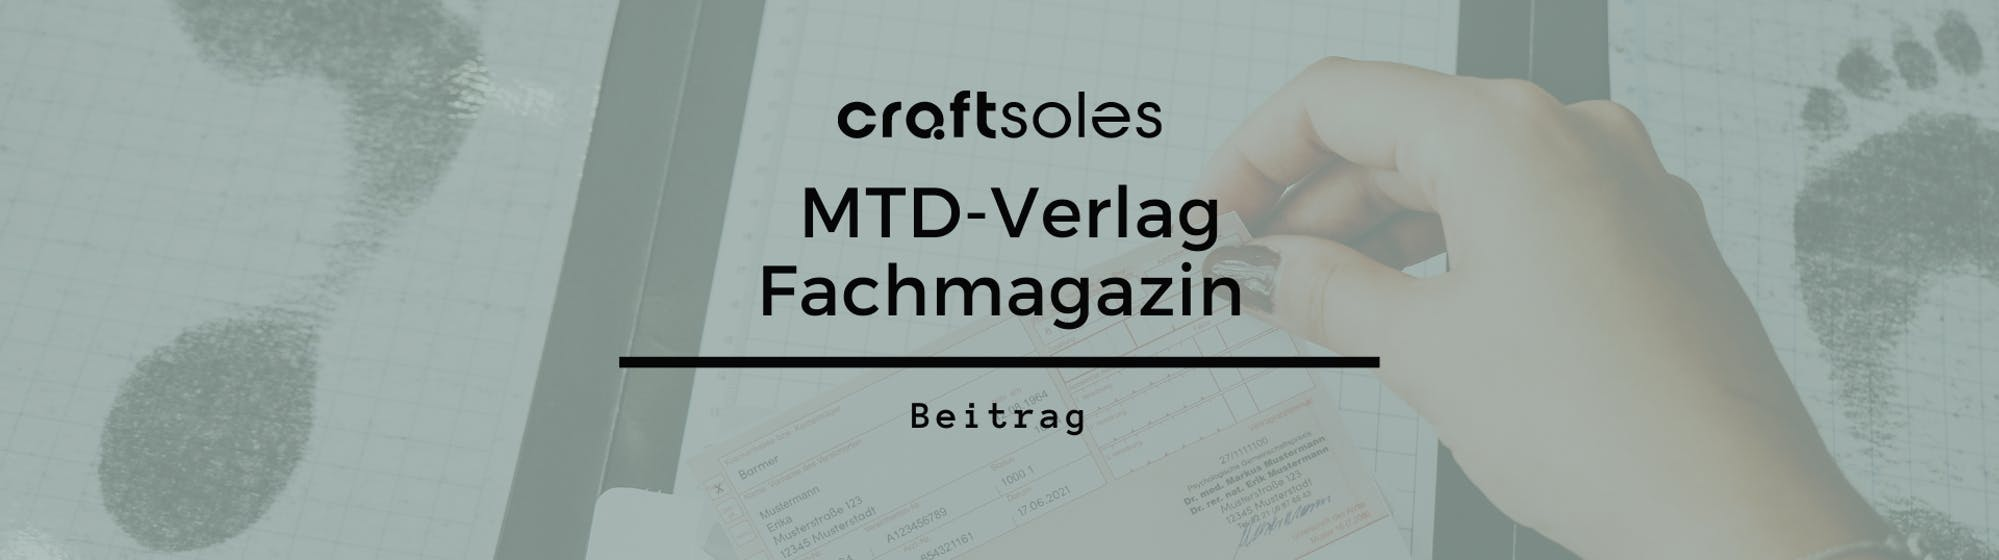 MTD-Verlag Beitrag Barmer